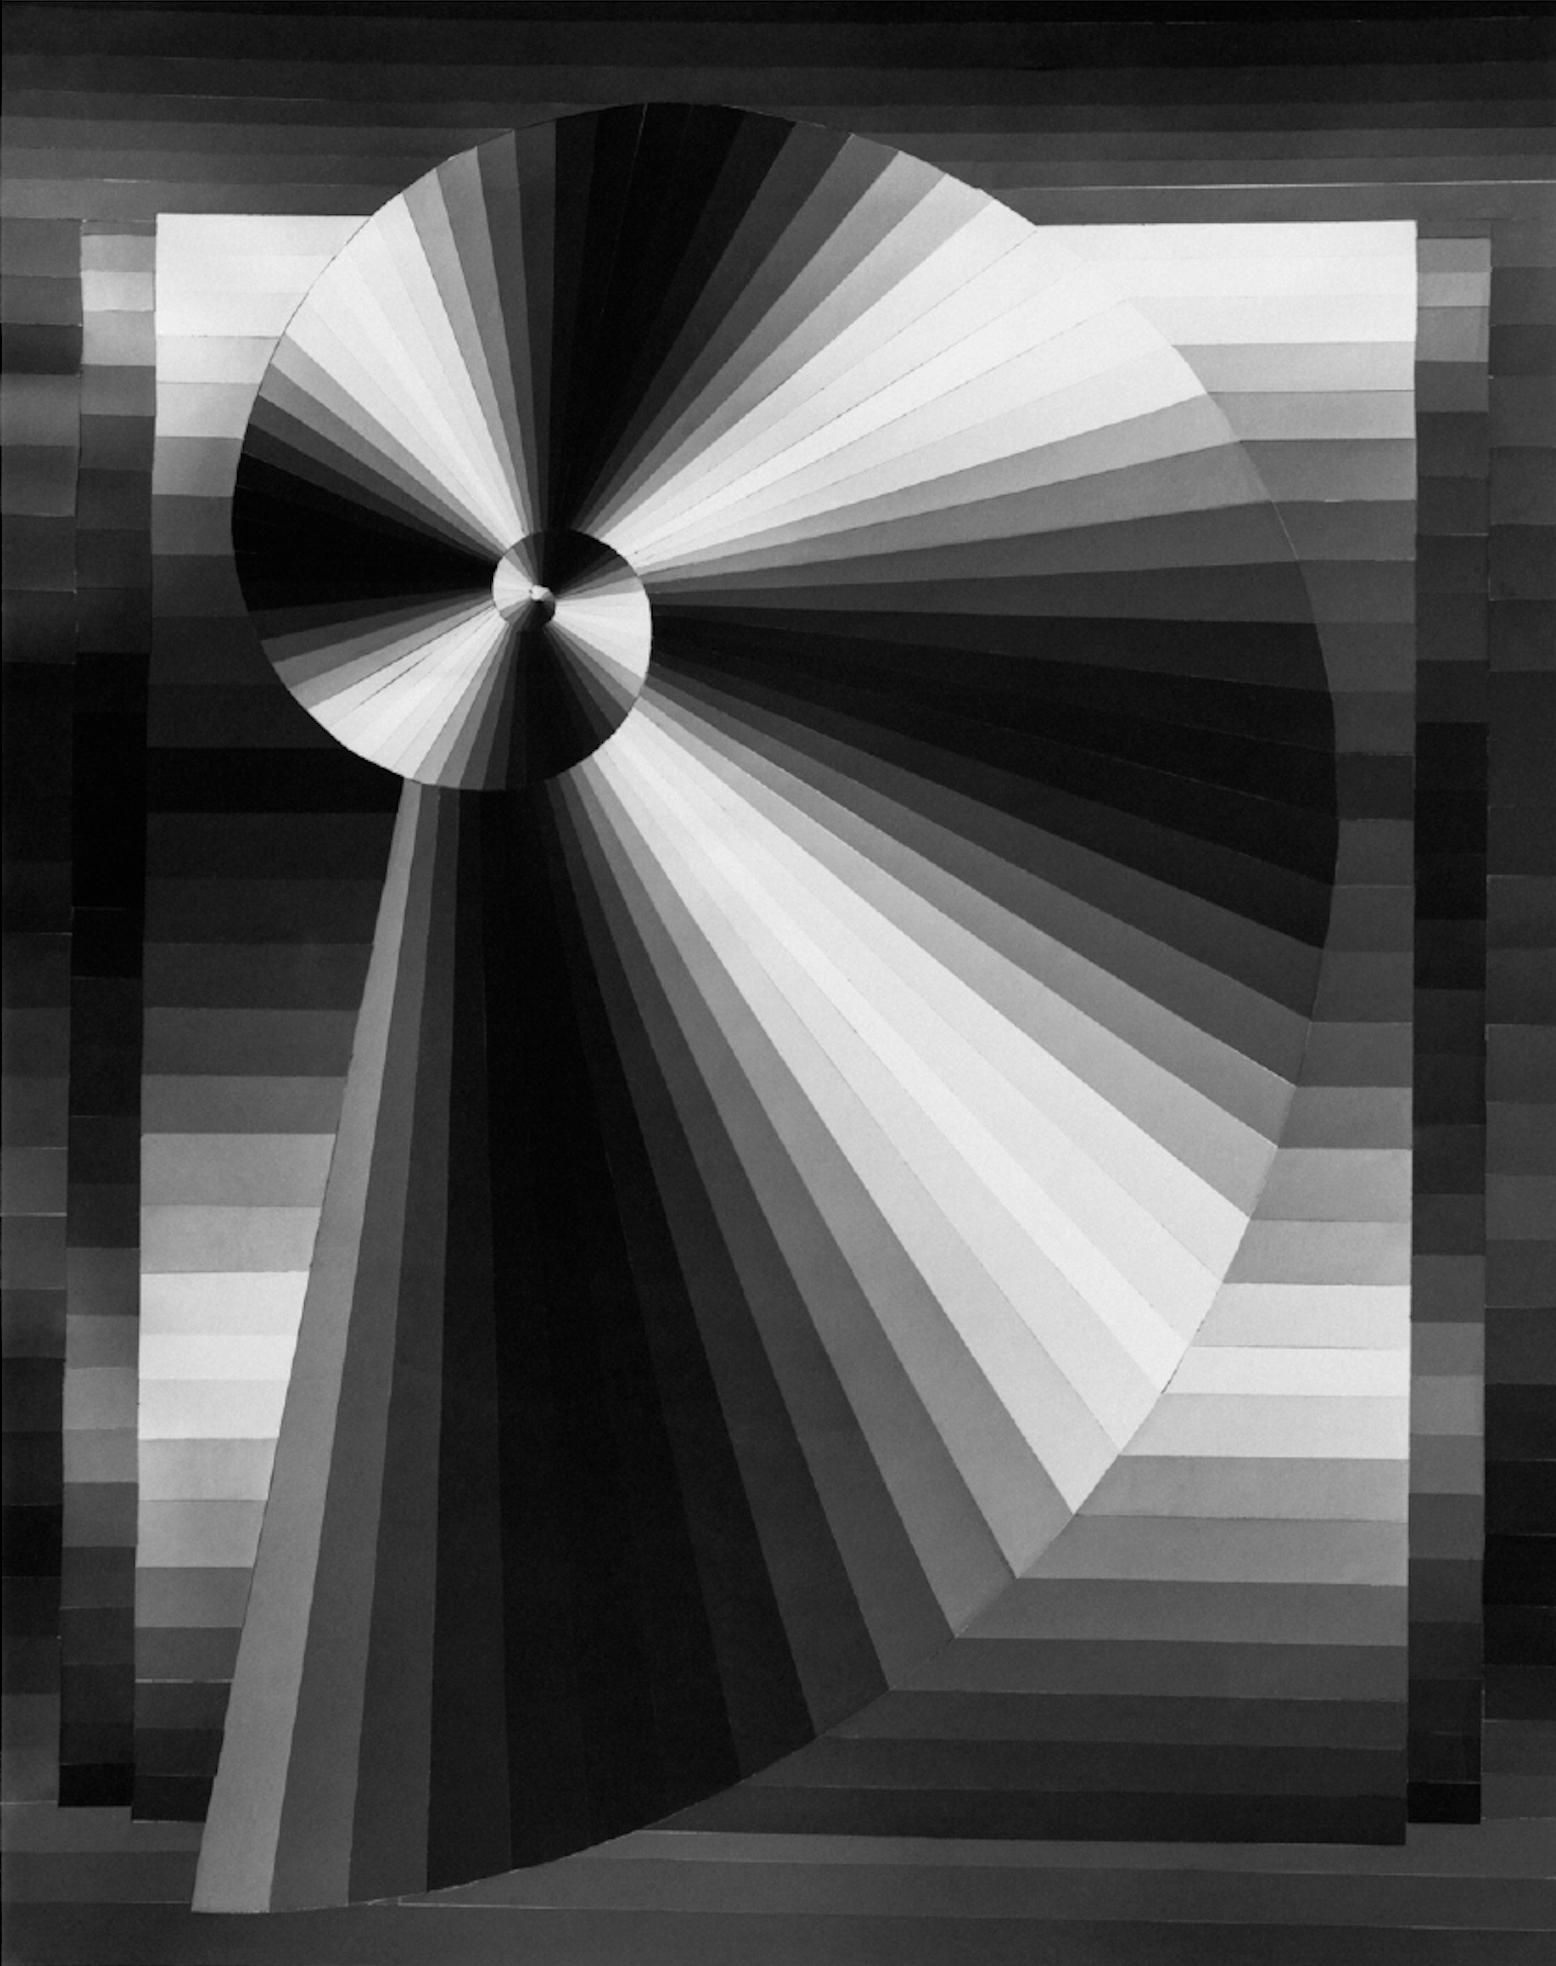 Untitled, 2020, Inkjet print on Hahnemühle Photo Rag Matte 188 gr paper, 133.5 x 105 cm